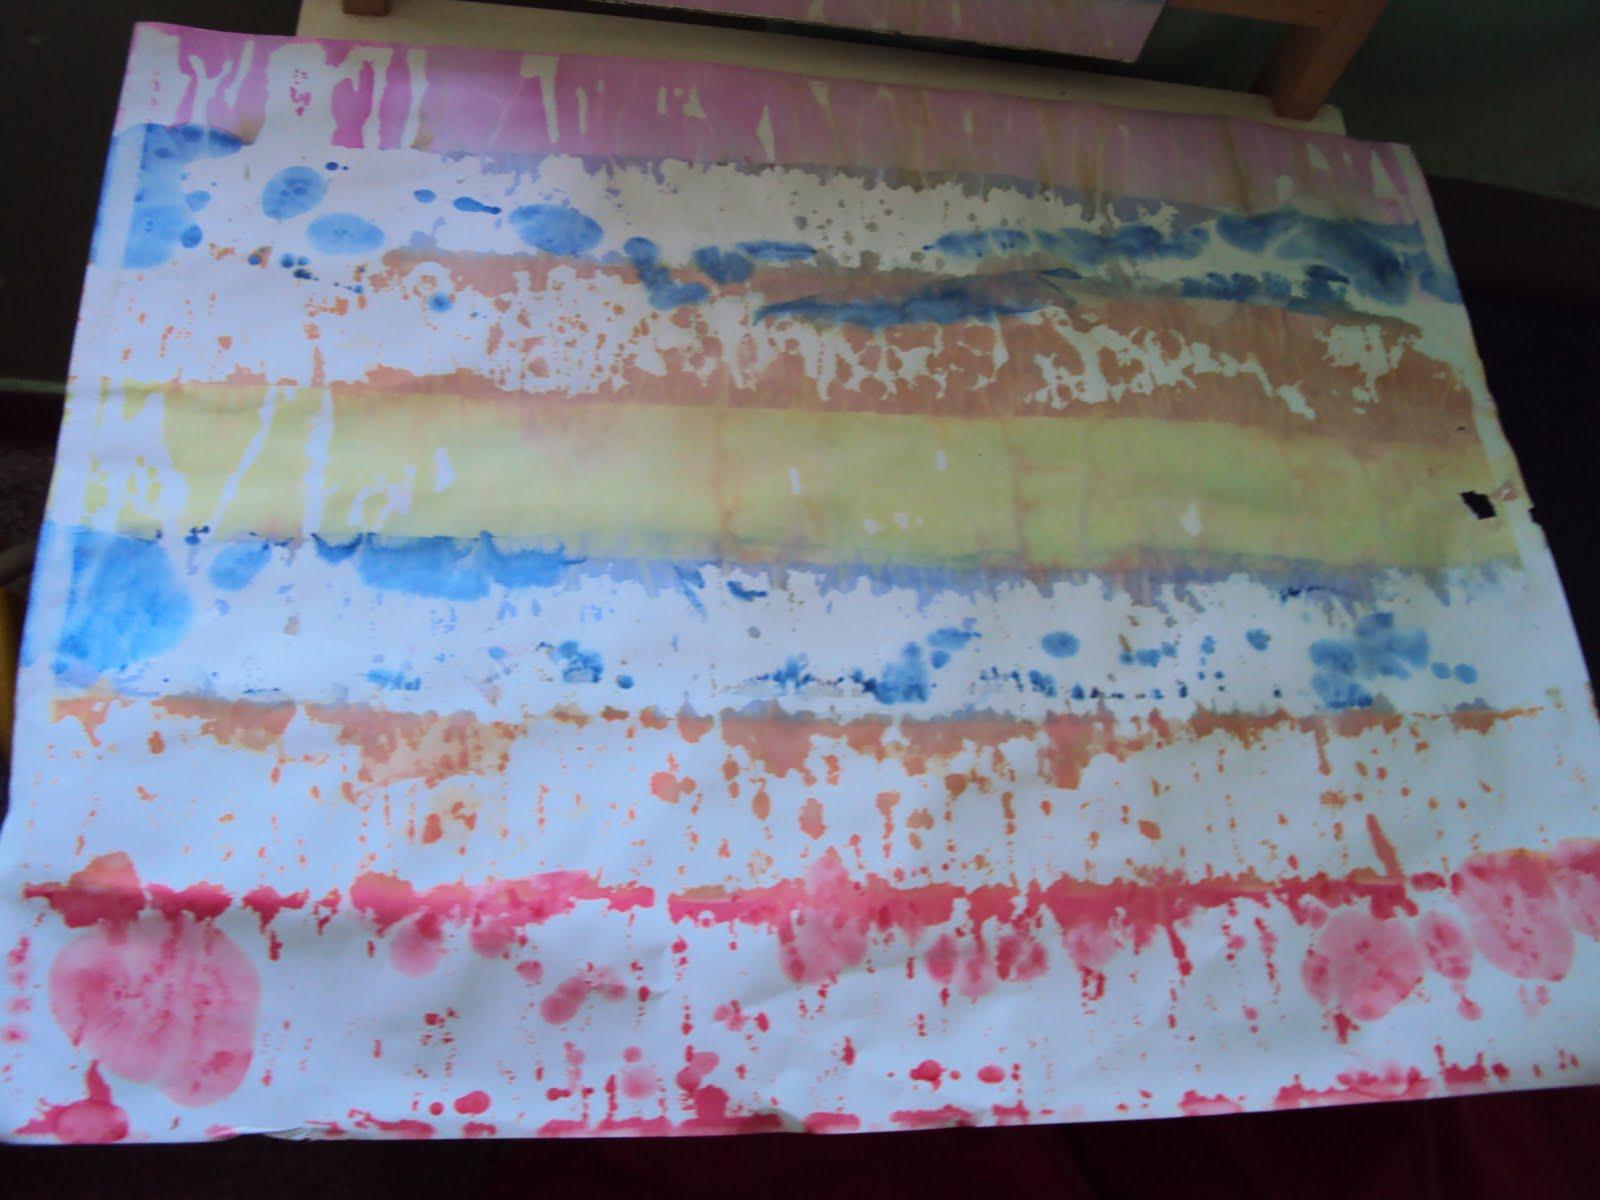 Quarteto fant stico t cnicas de pinturas - Pintura infantil pared ...